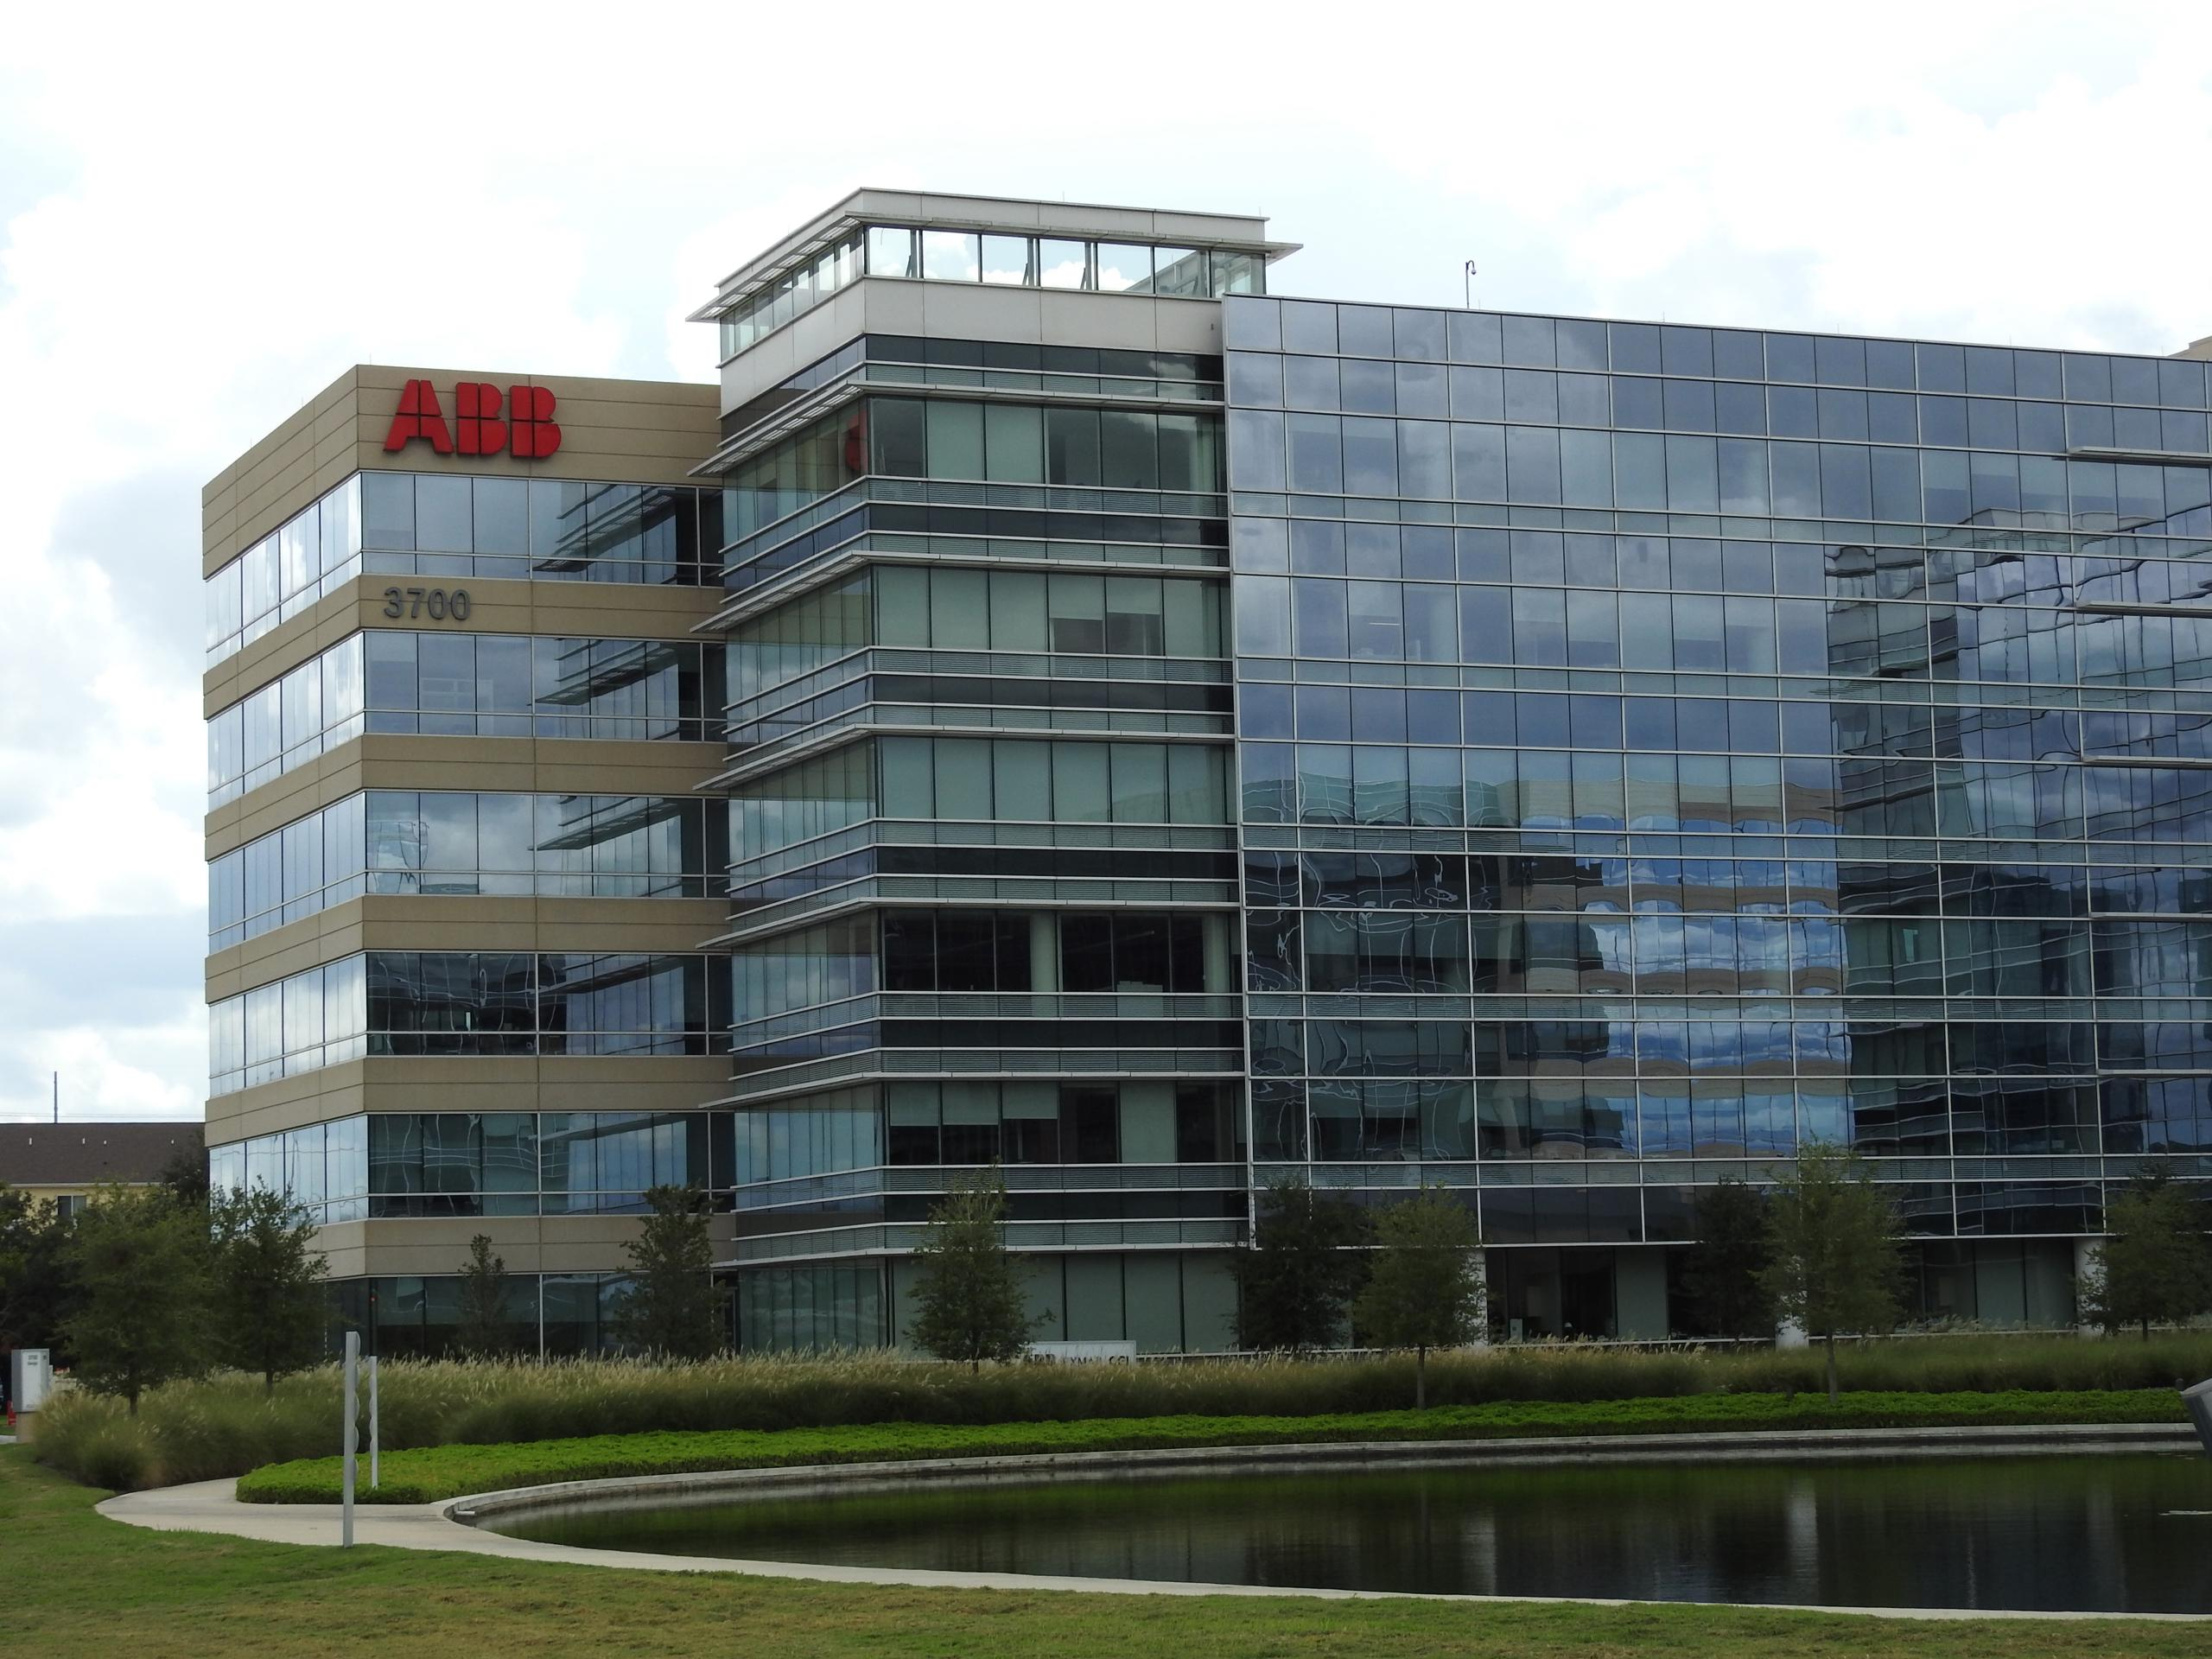 ABB office in Houston, Texas.